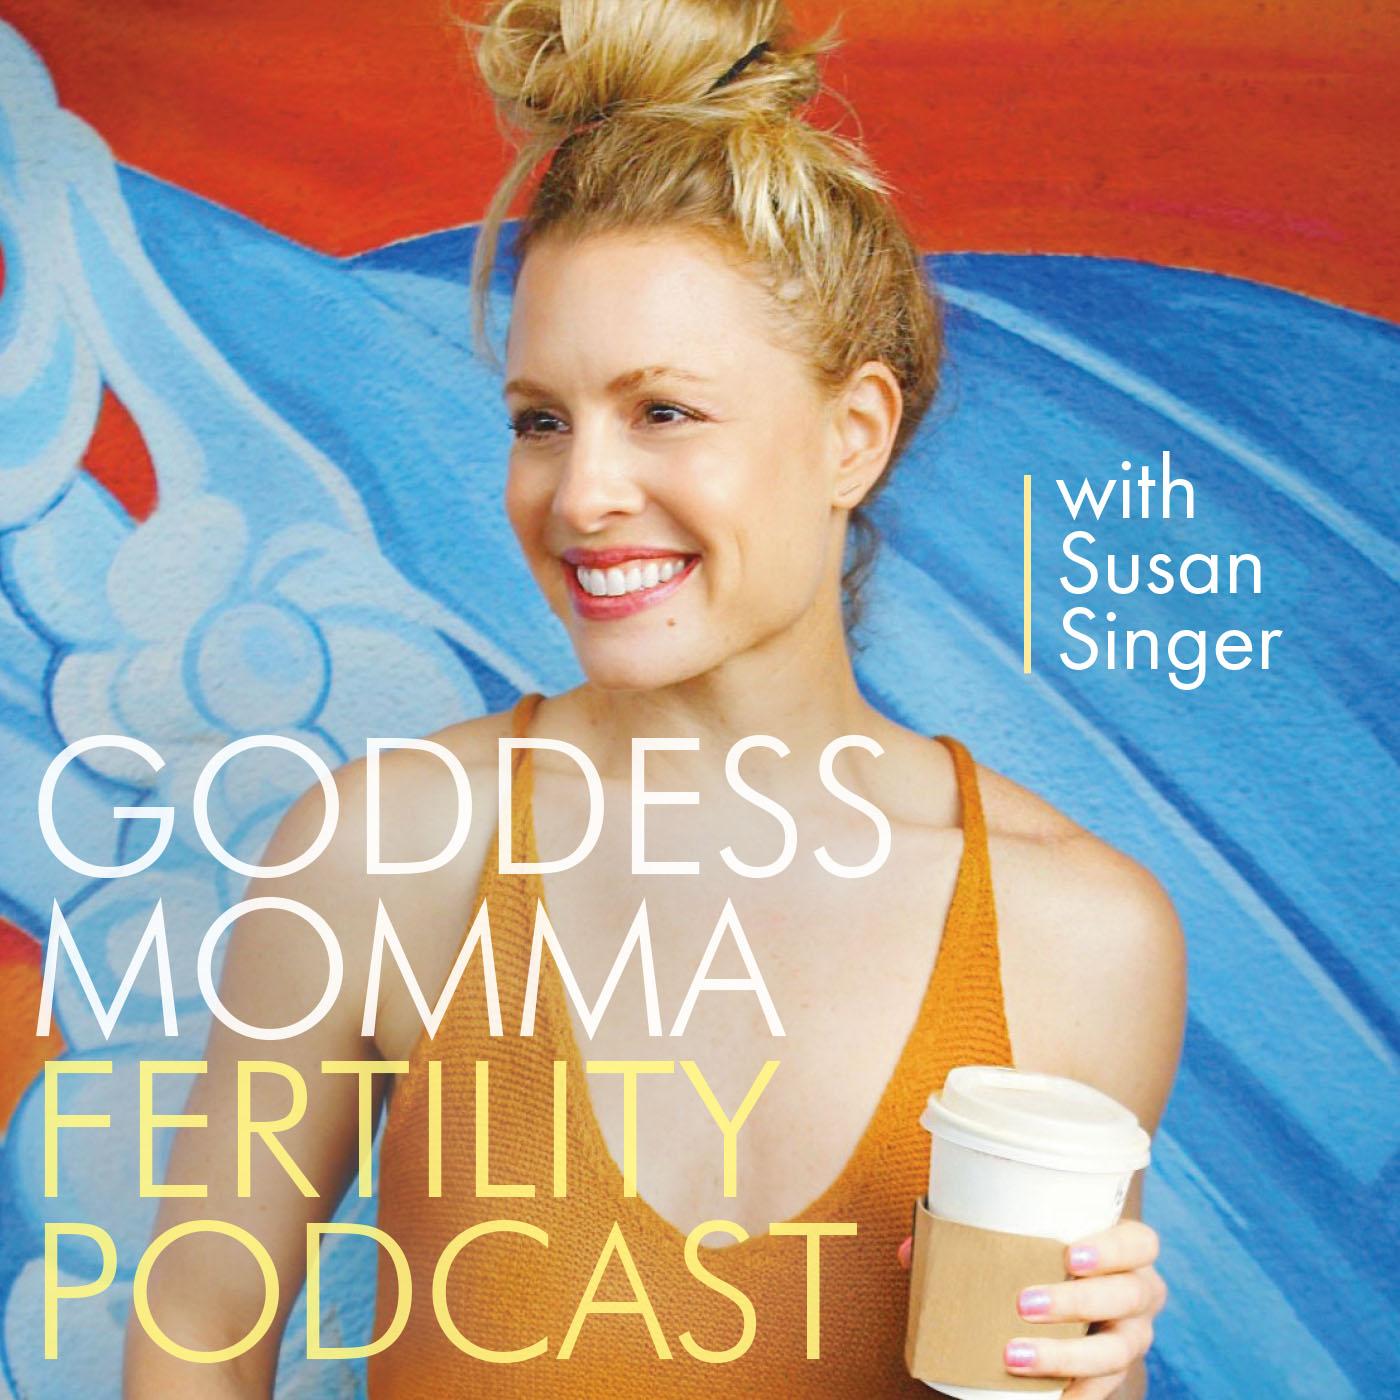 Goddess Momma Fertility Podcast | Libsyn Directory